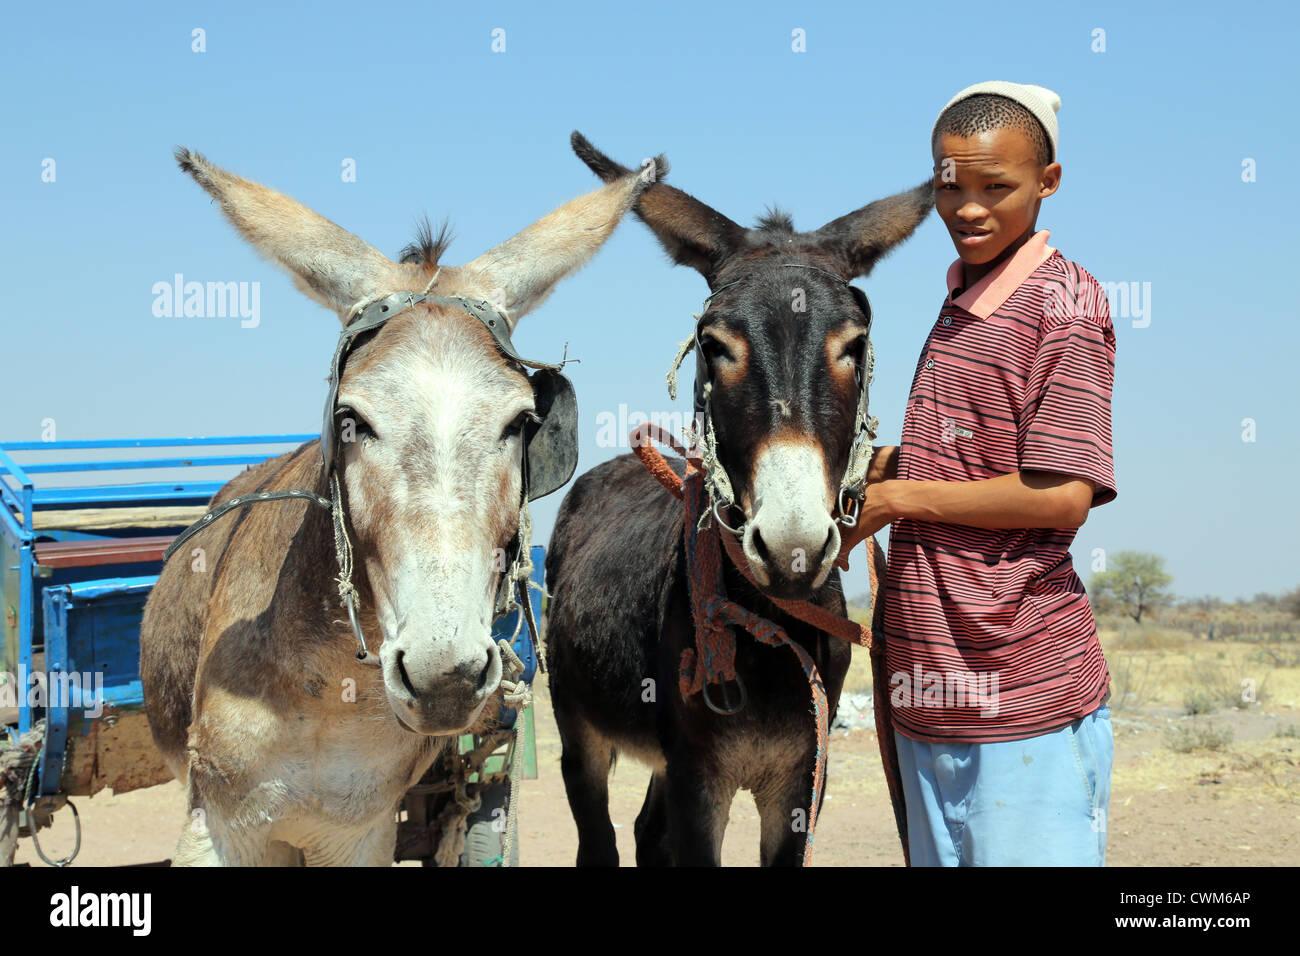 Boy of the indigenous San tribe stretches donkeys to a cart, Namibia, Kalahari desert - Stock Image